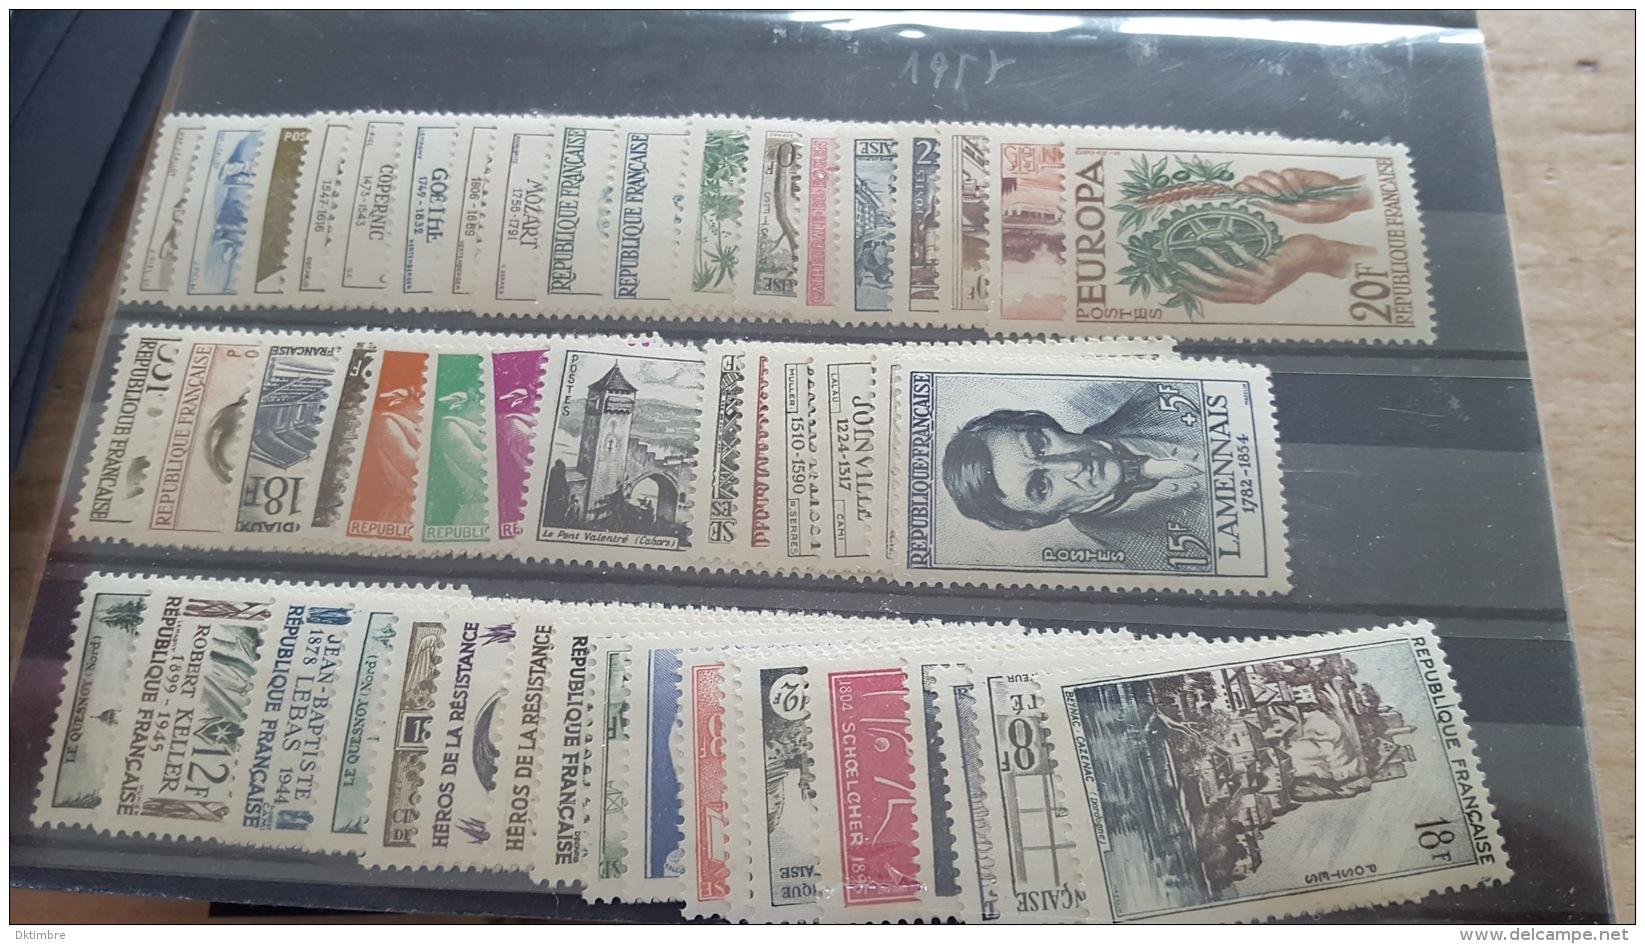 LOT 362805 TIMBRE DE FRANCE NEUF** ANNEE 1957 DEPART A 1€ - France